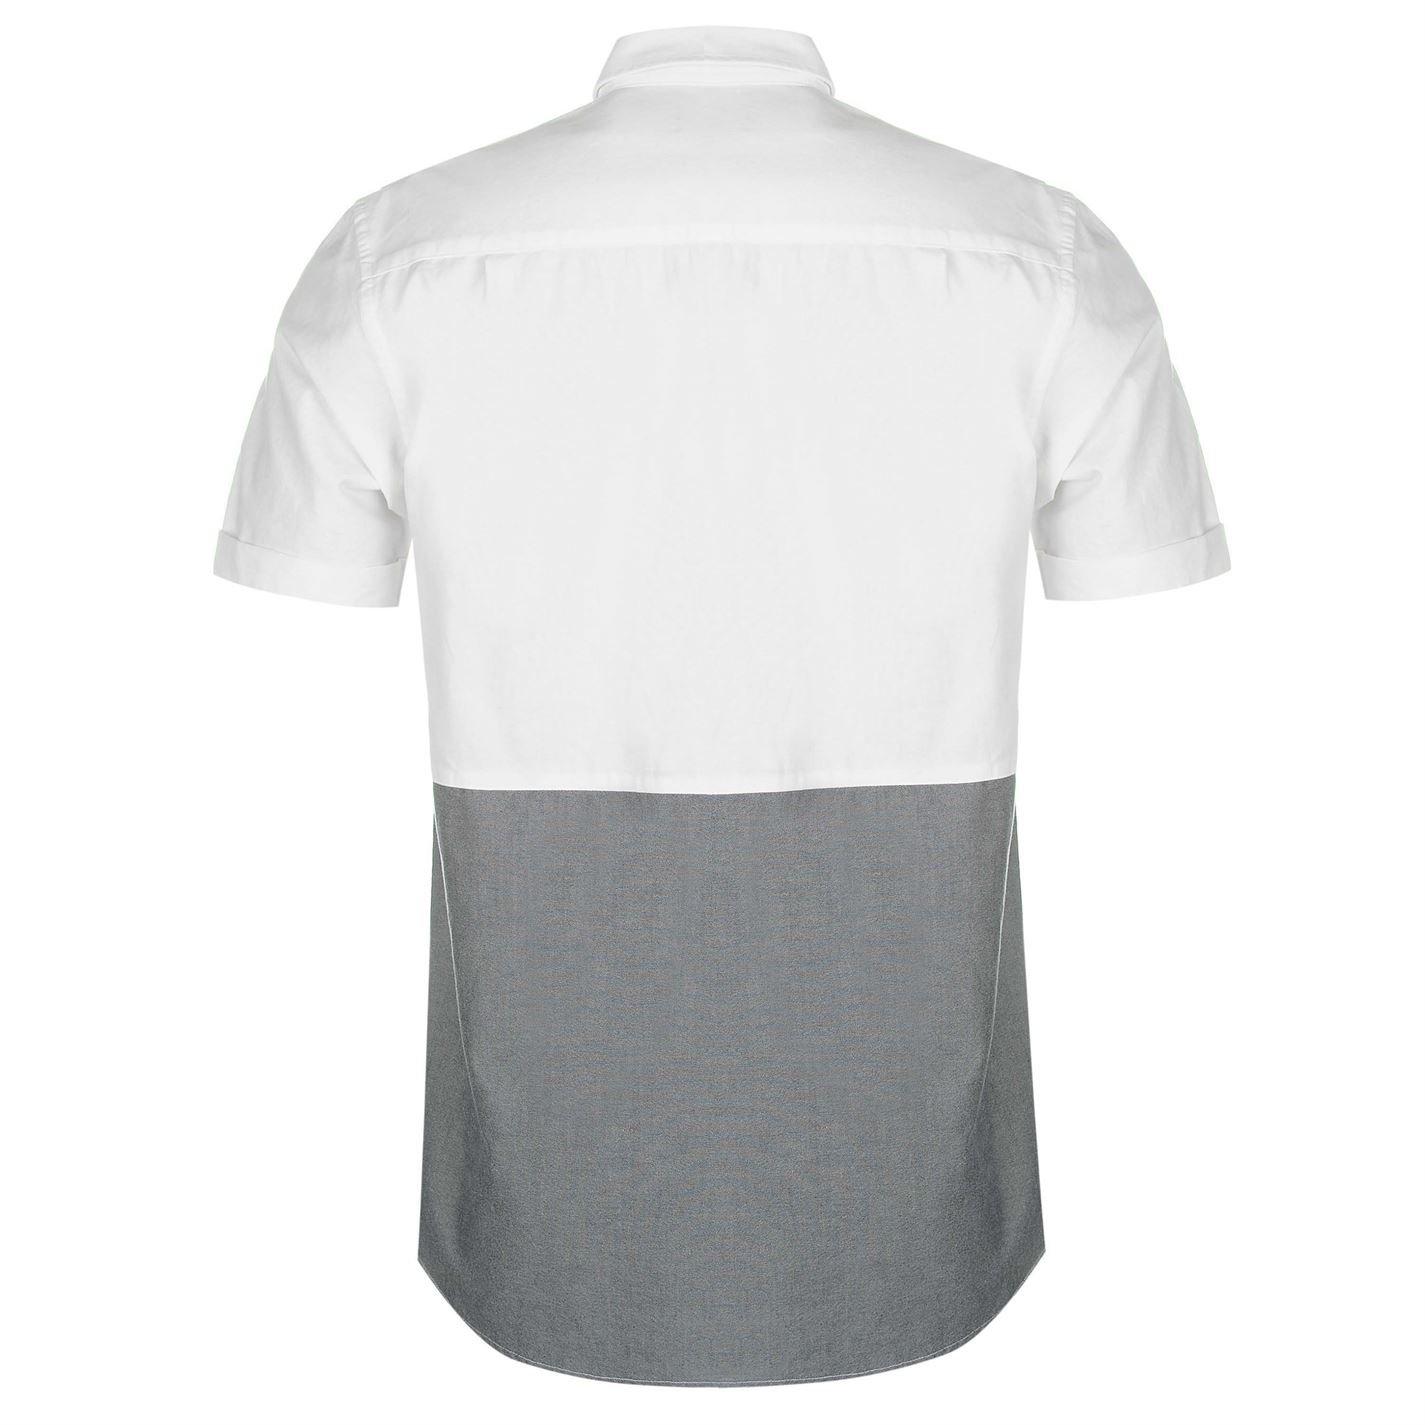 Pierre Cardin Mens Panel Short Sleeve Shirt